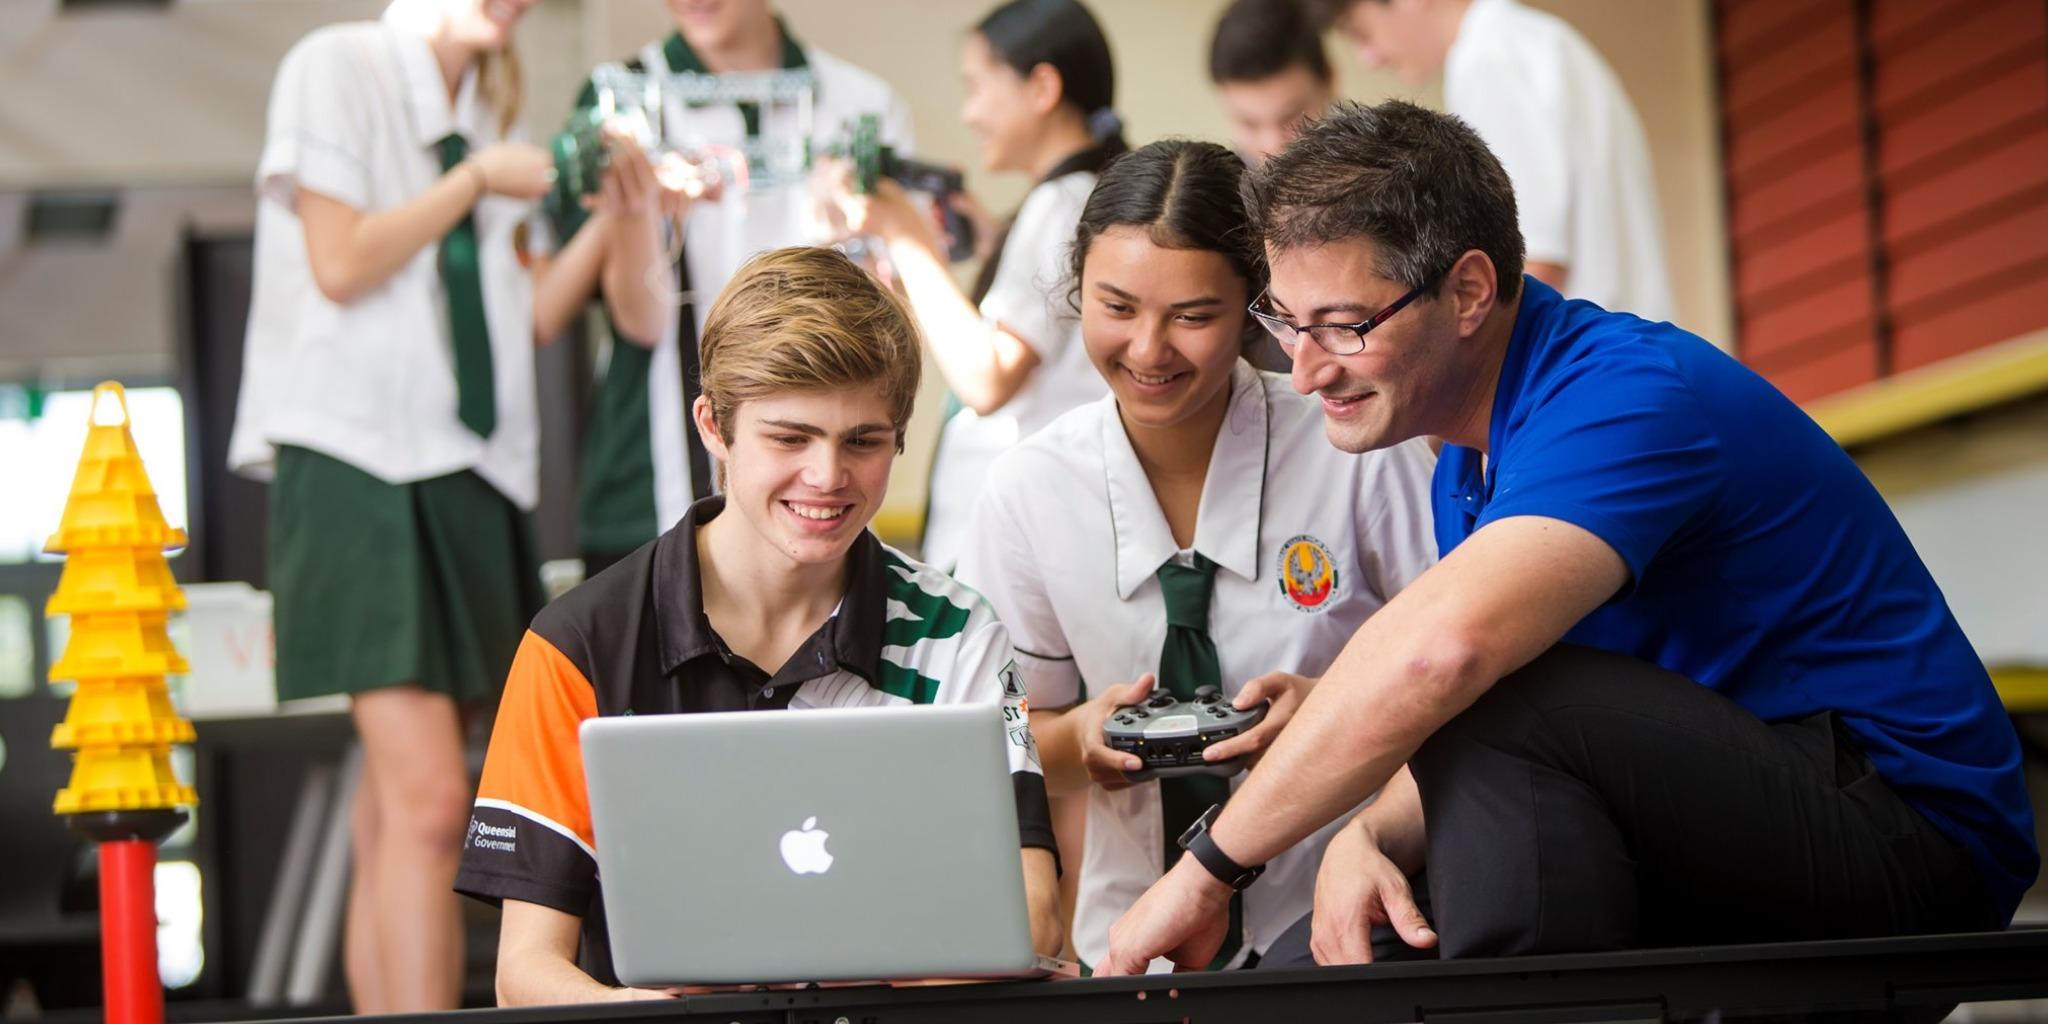 ISI国際学院 高校留学 オーストラリア留学 Marrimac State High School